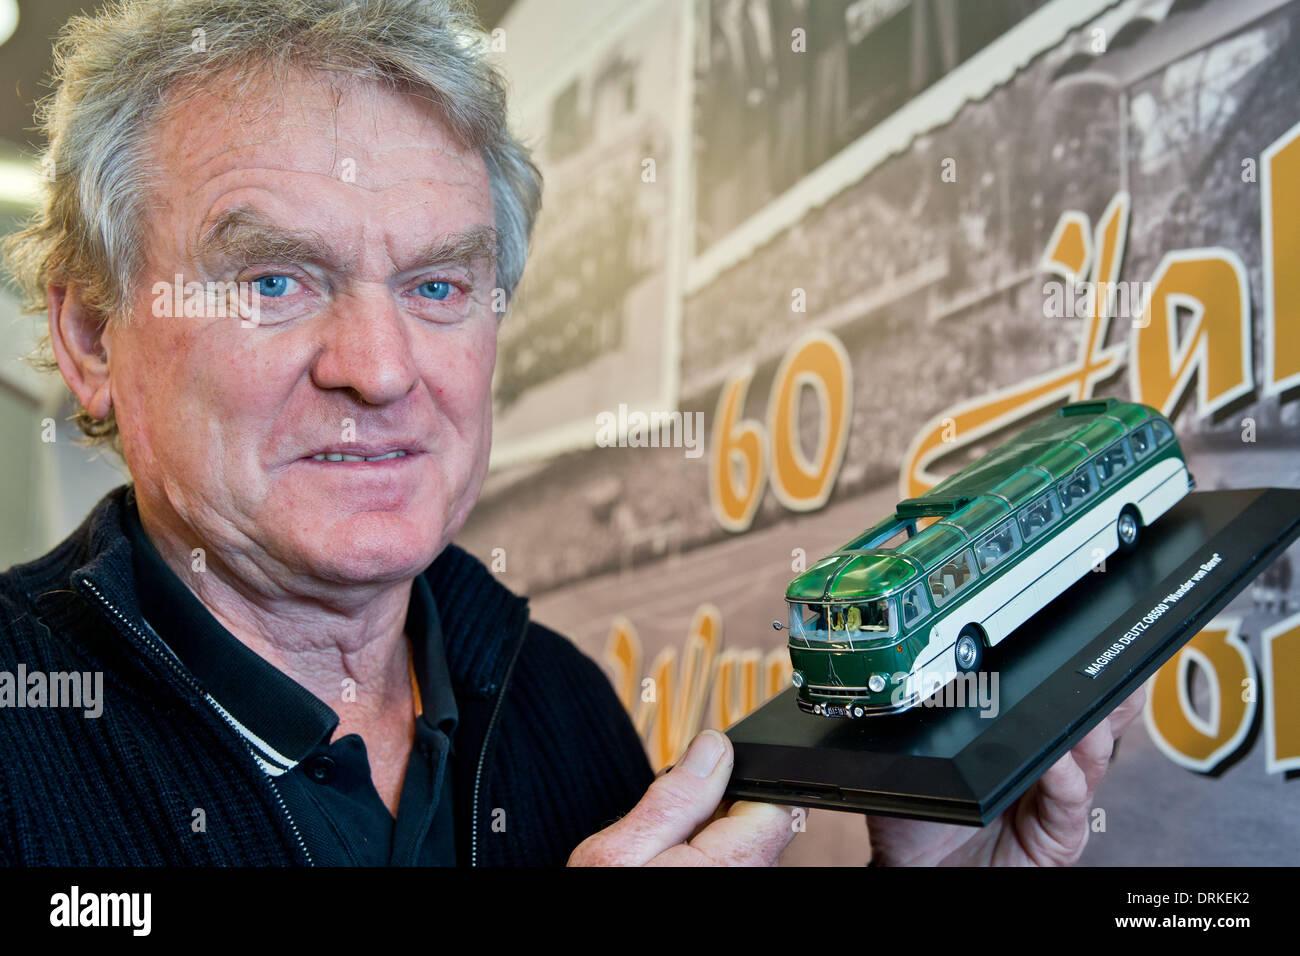 Nuremberg, Alemania. 28 ene, 2014. Antigua nacional guardameta Sepp Maier presenta un modelo de la Magirus S6500 Foto de stock